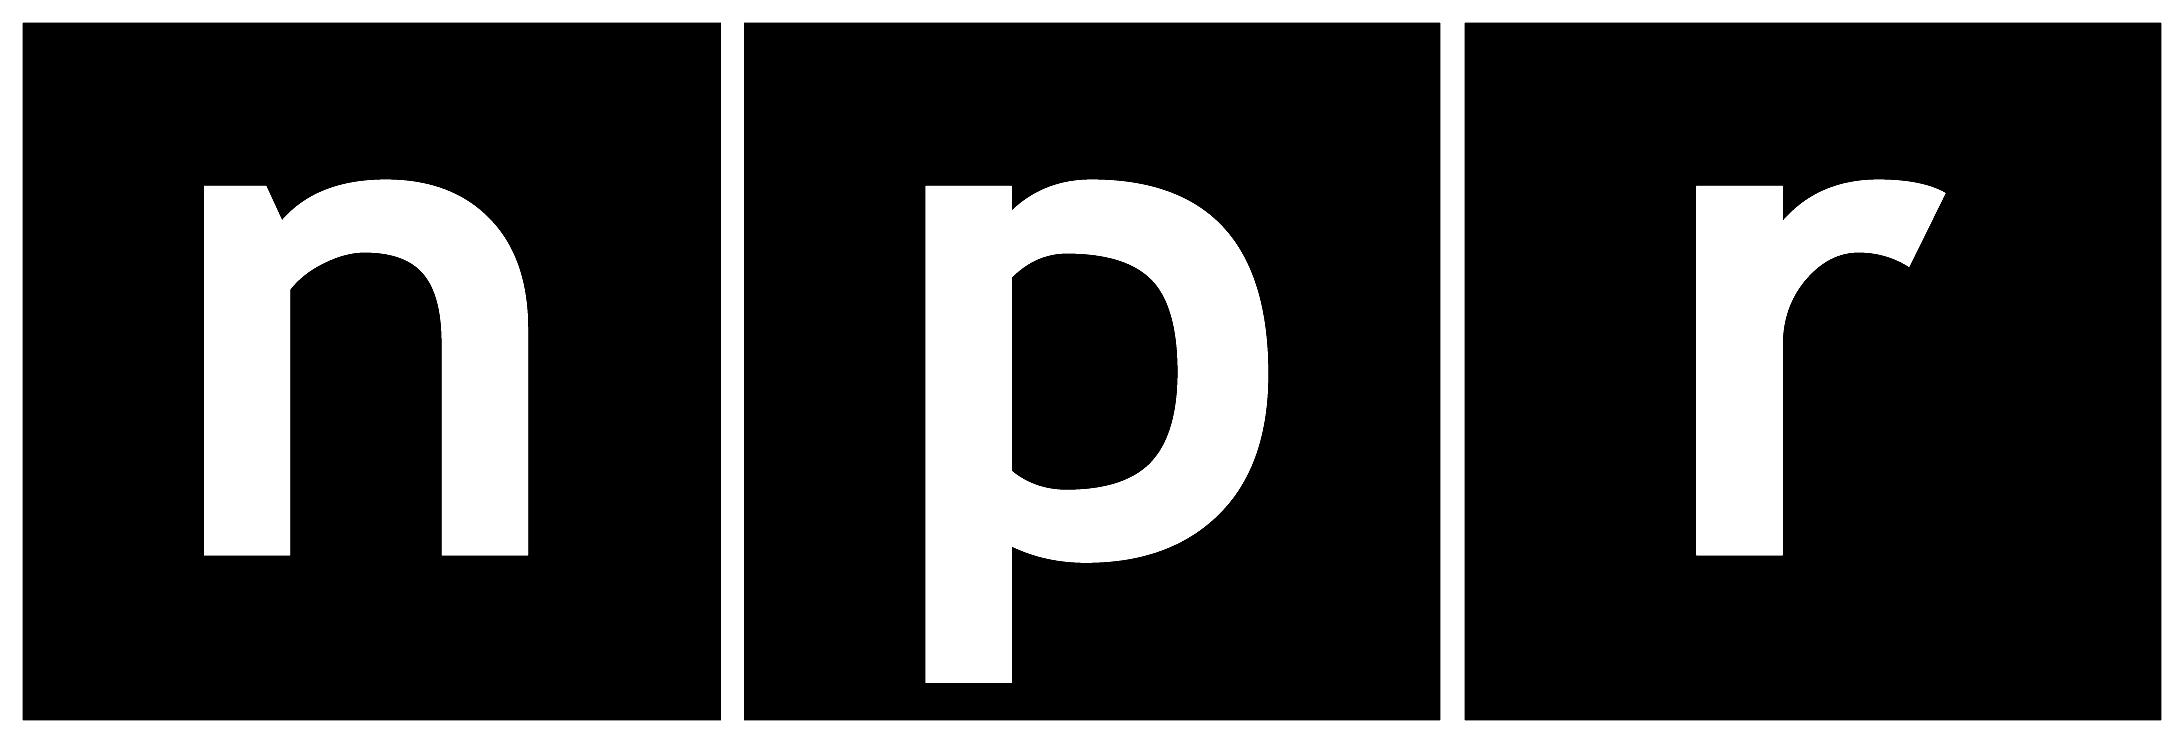 25-259003_home-pacify-image-npr-logo-png-clipart (1)